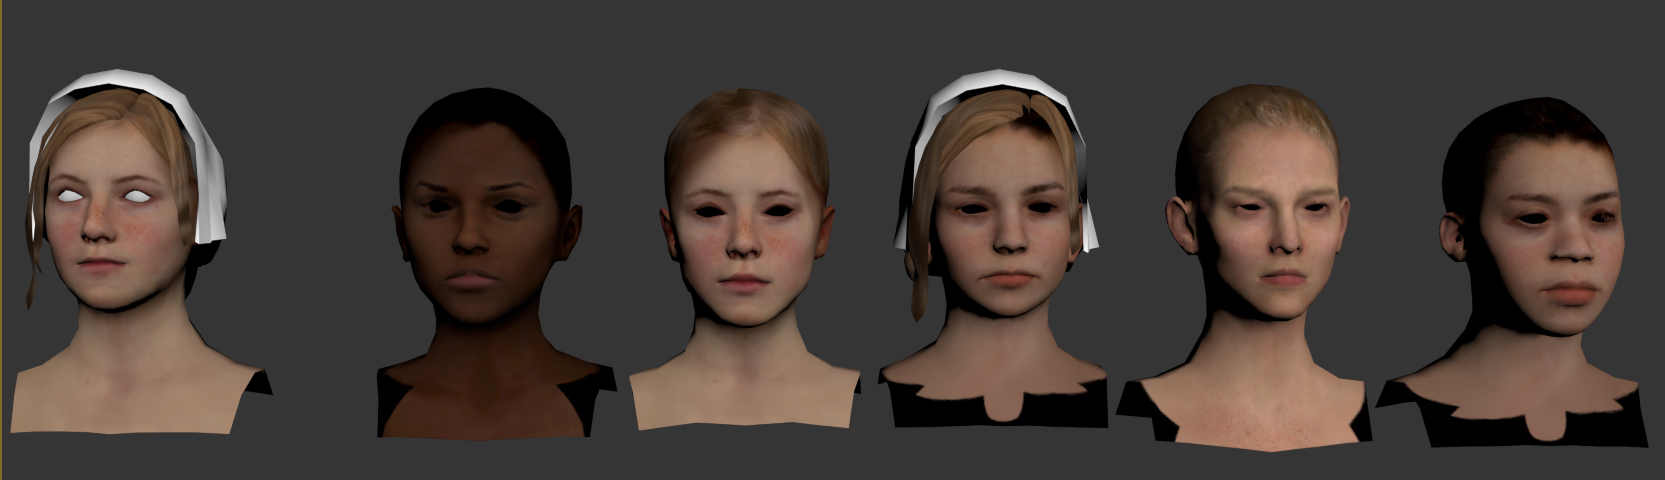 mayflower avatars